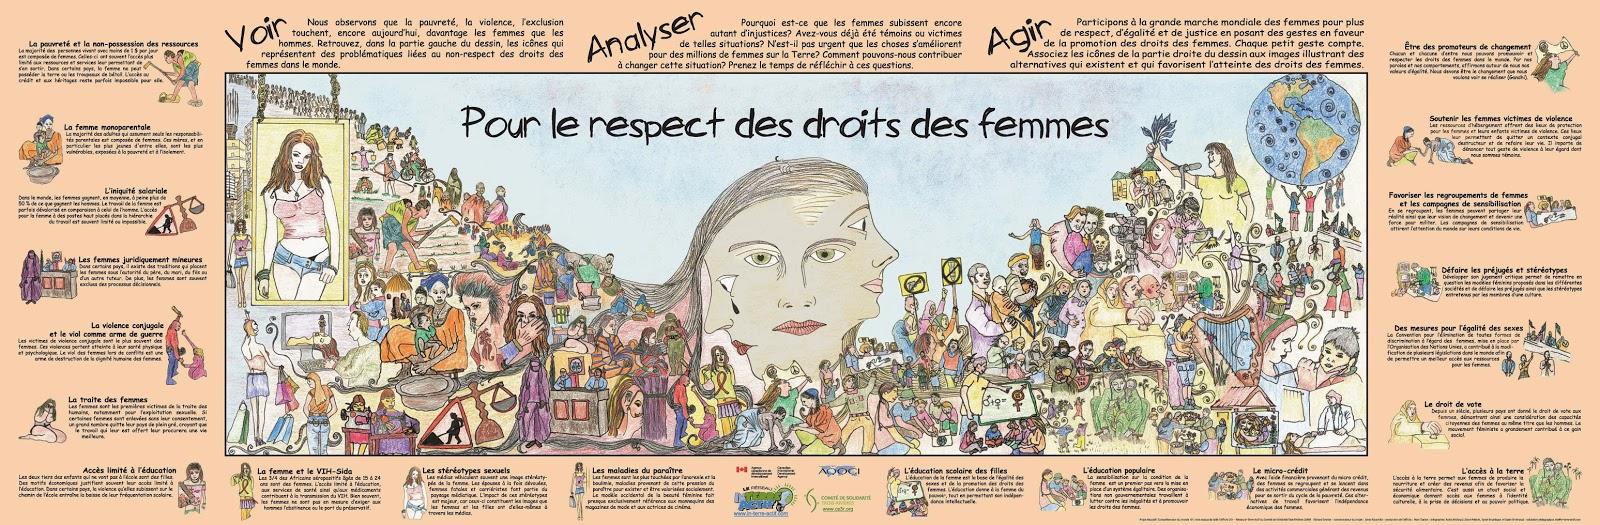 http://in-terre-actif.com/affiche_femmes/